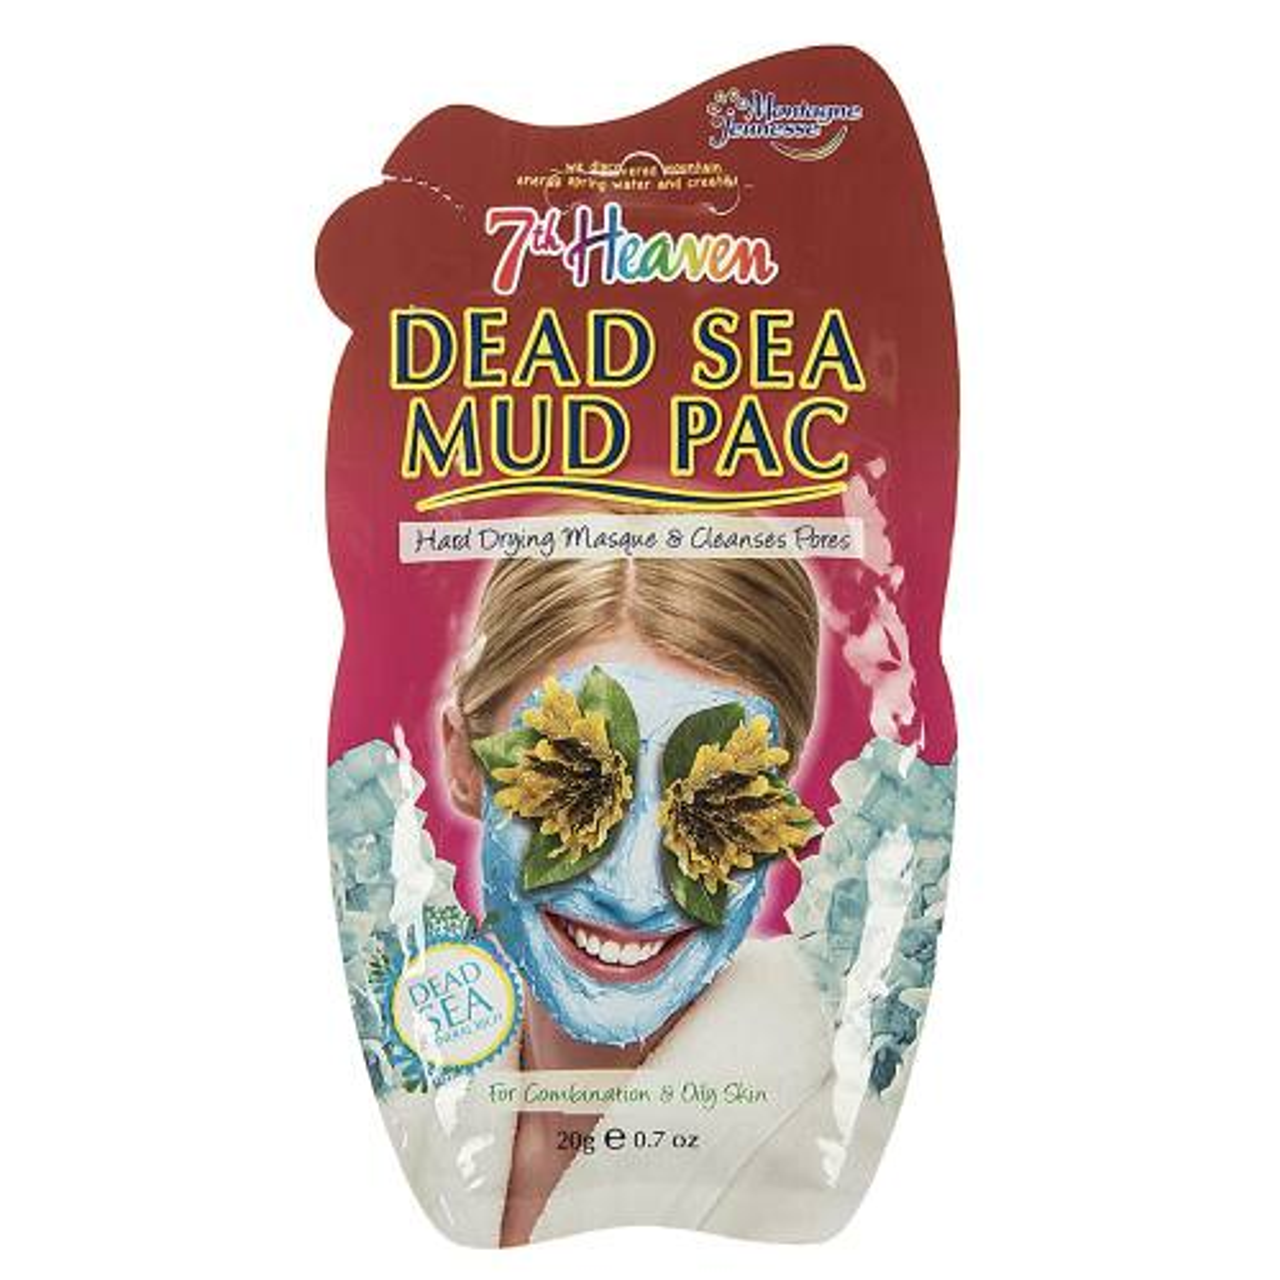 ماسک صورت مونته ژنه سری 7th Heaven مدل Dead Sea حجم 20 میلی لیتر